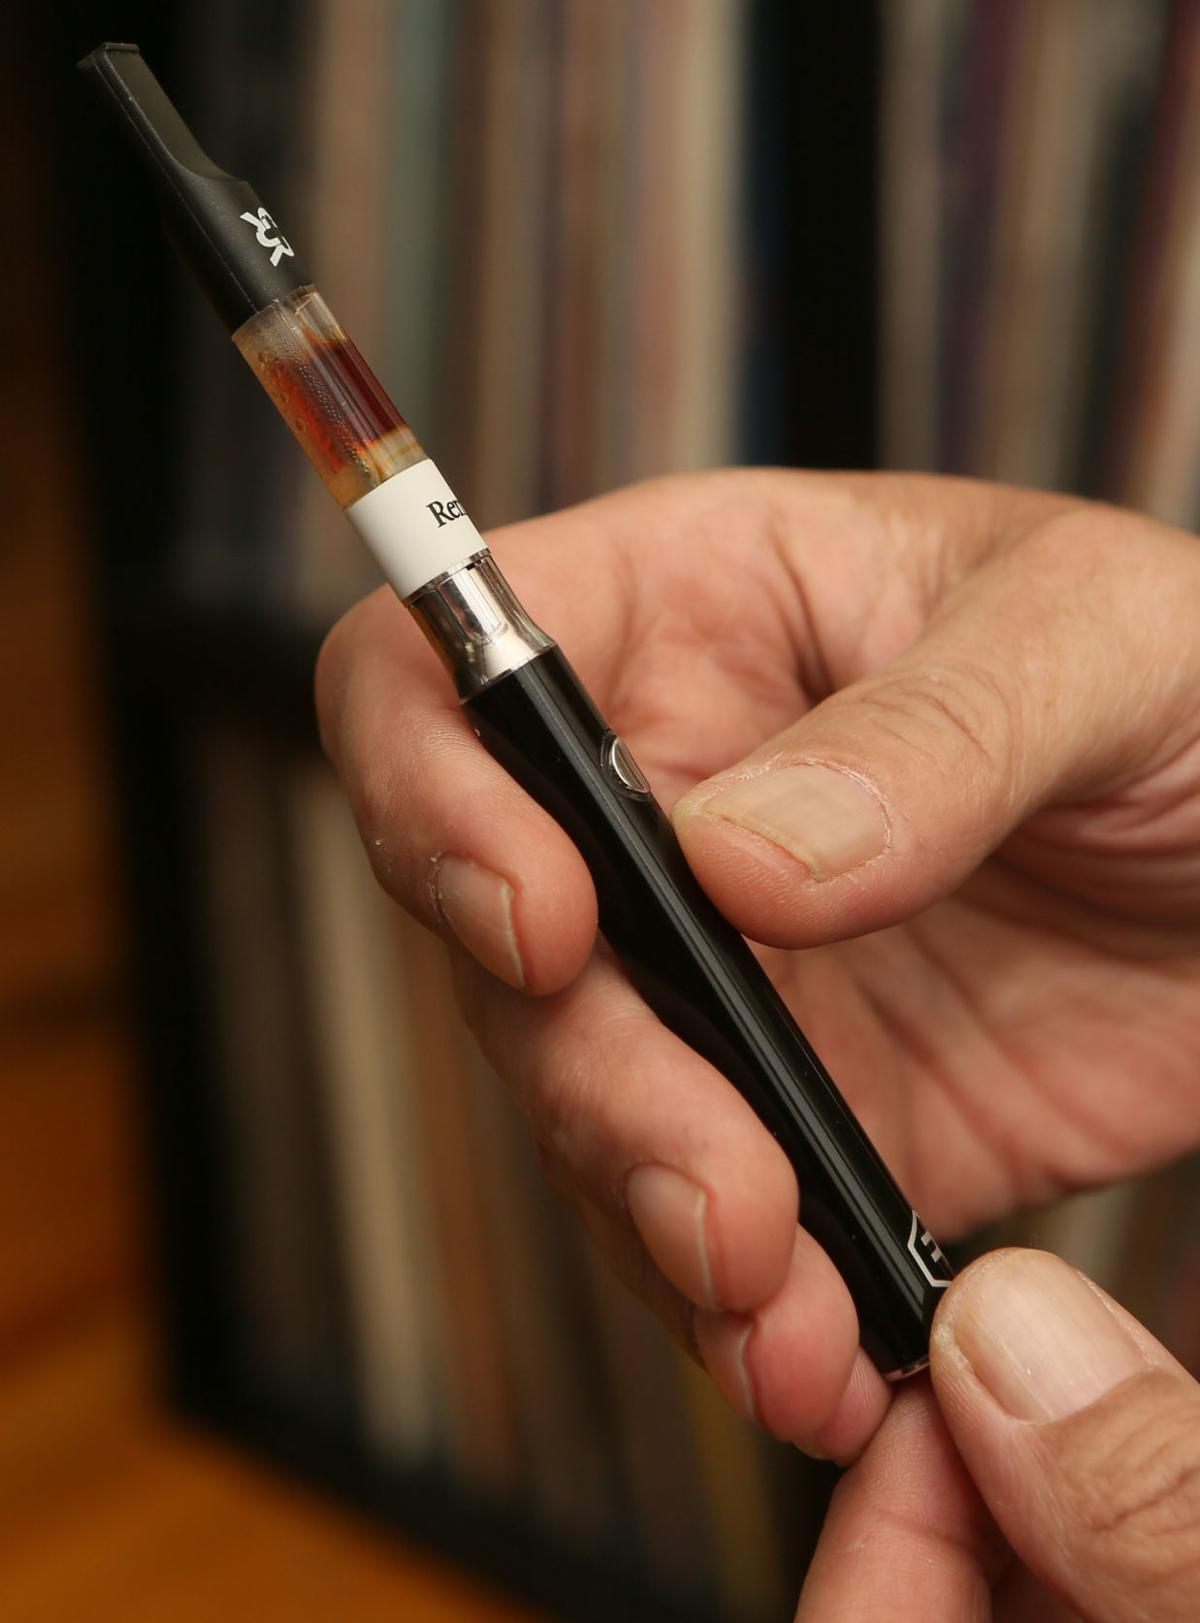 Paul Melvan uses medical marijuana to treat his chronic pain.